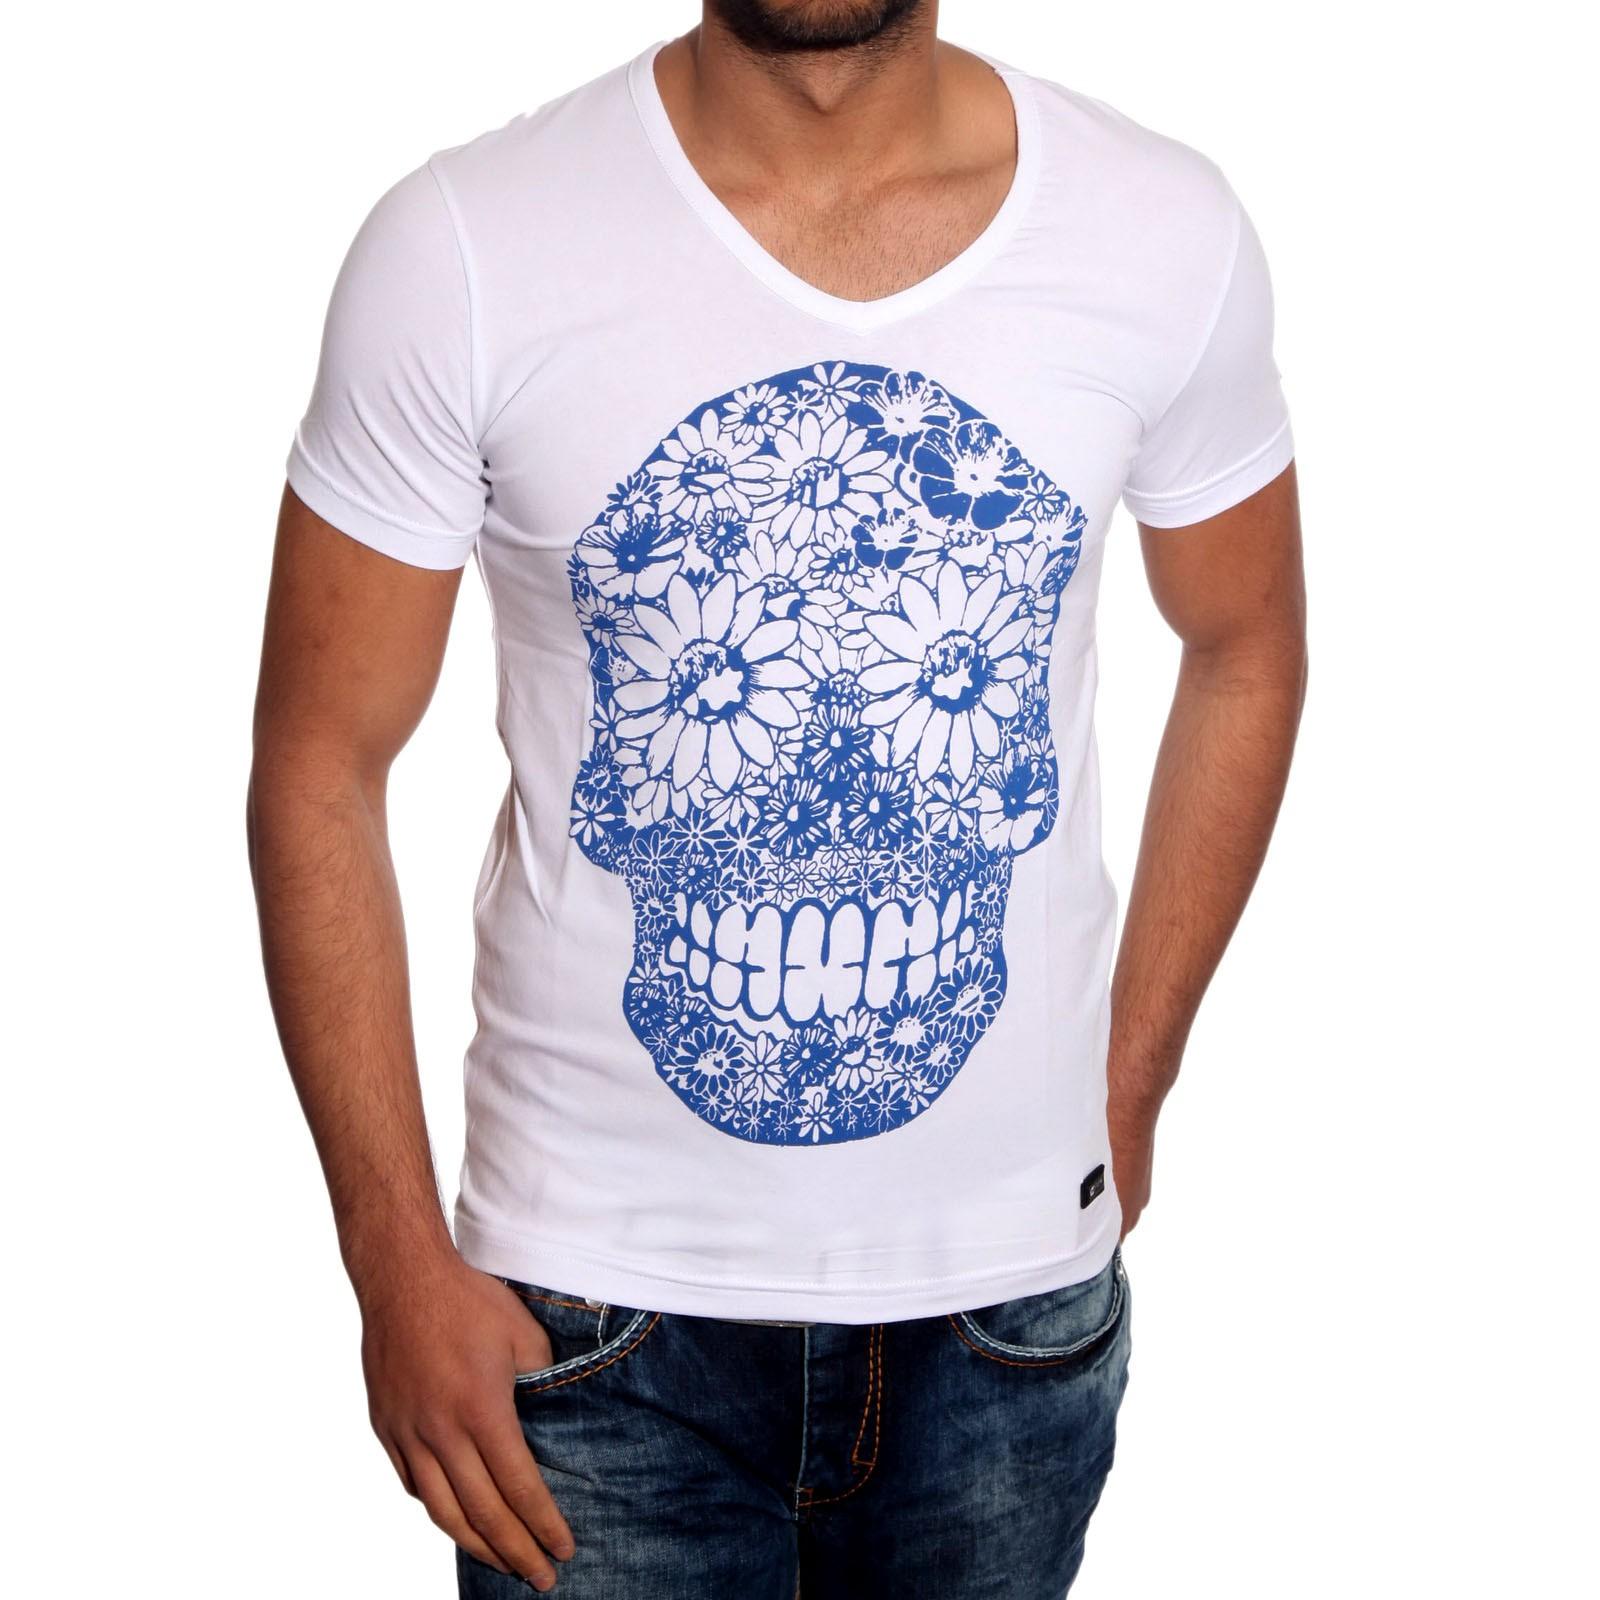 T-Shirt Weiß 6678 R-Neal